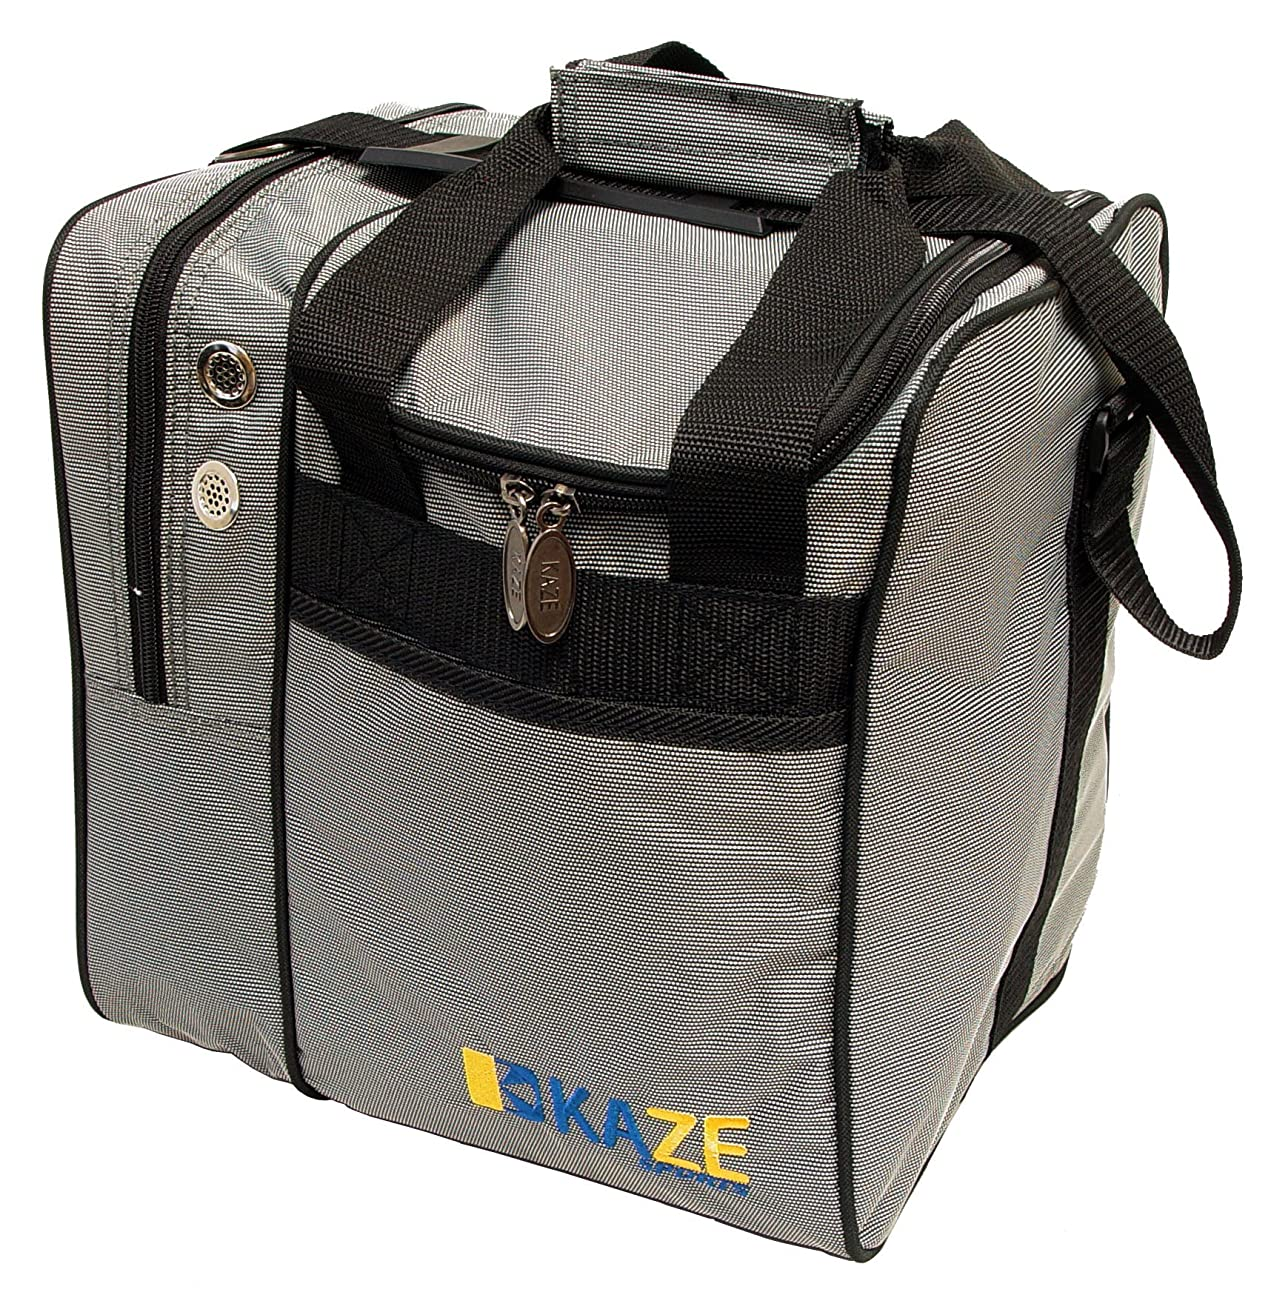 KAZE SPORTS Deluxe Single Ball Bowling Tote Bag